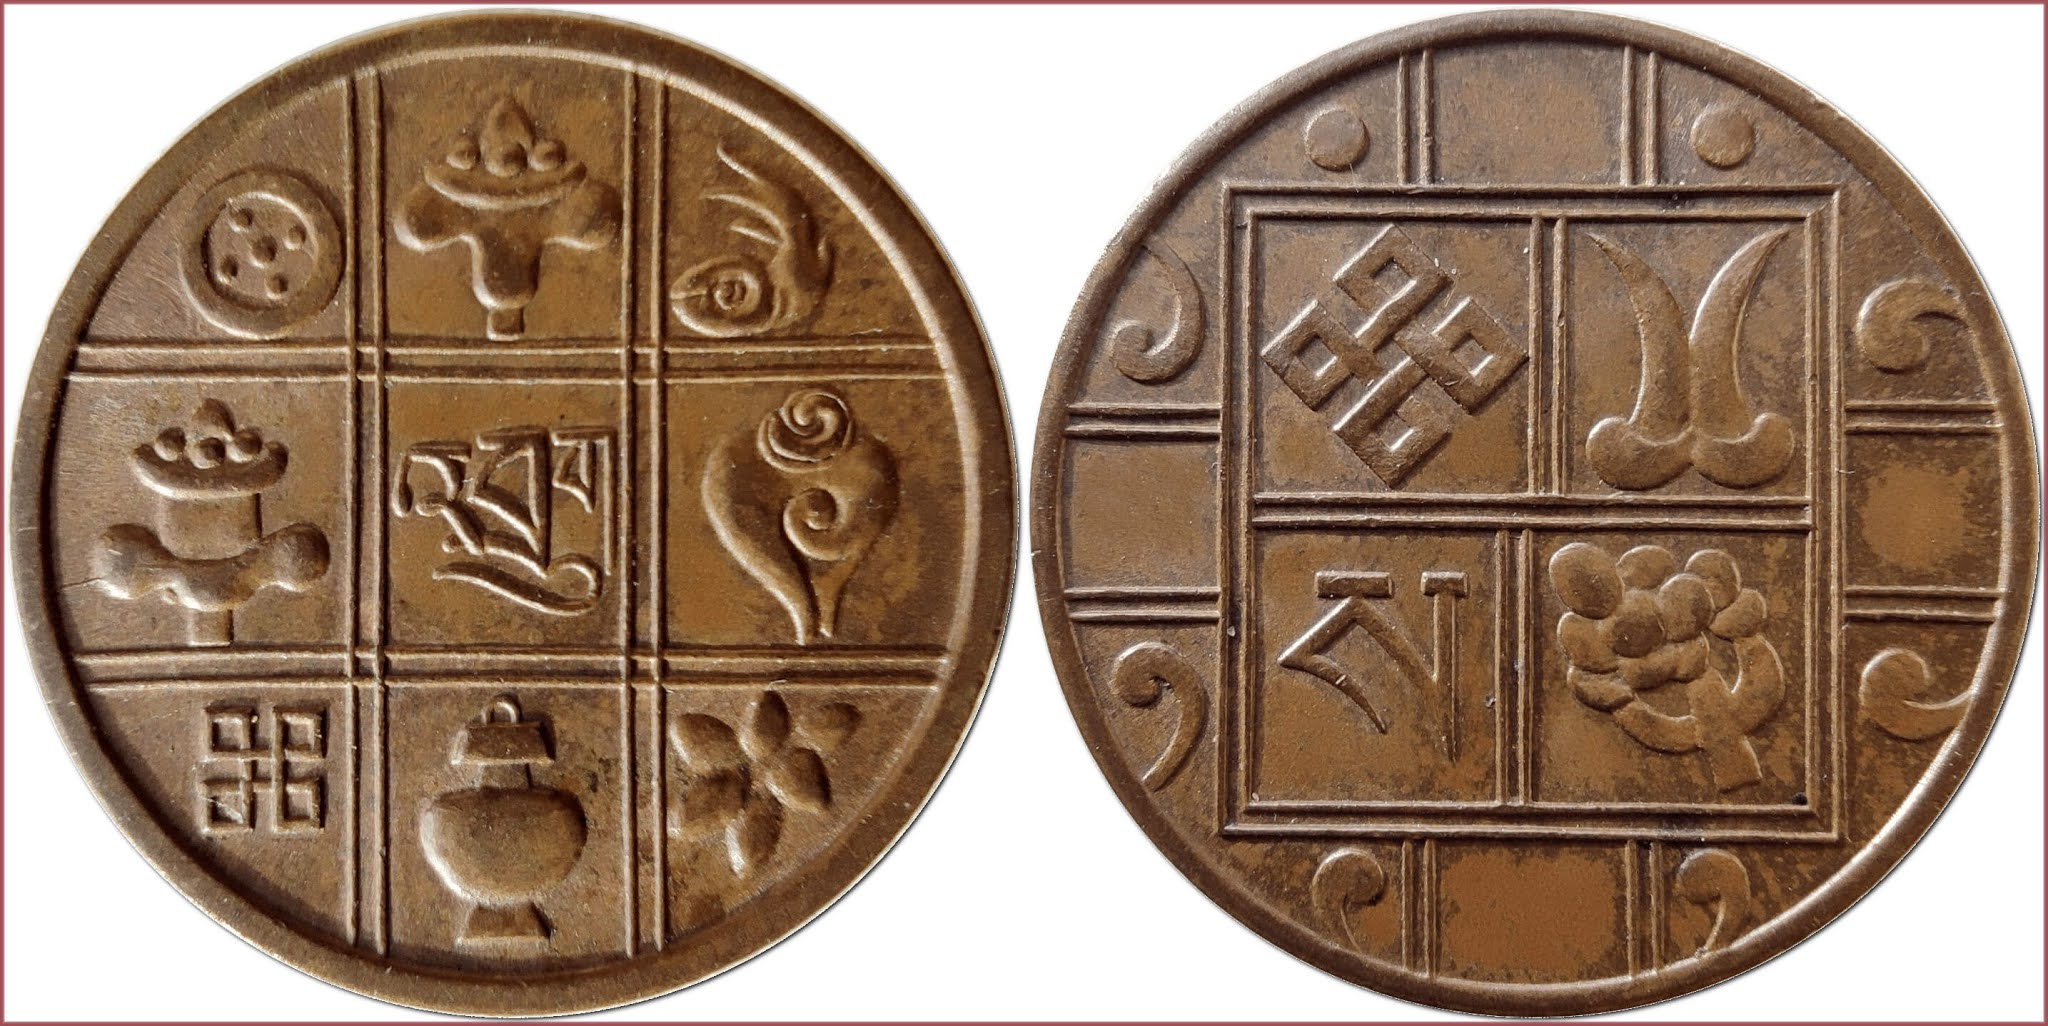 1 pice, ND (1954): Kingdom of Bhutan